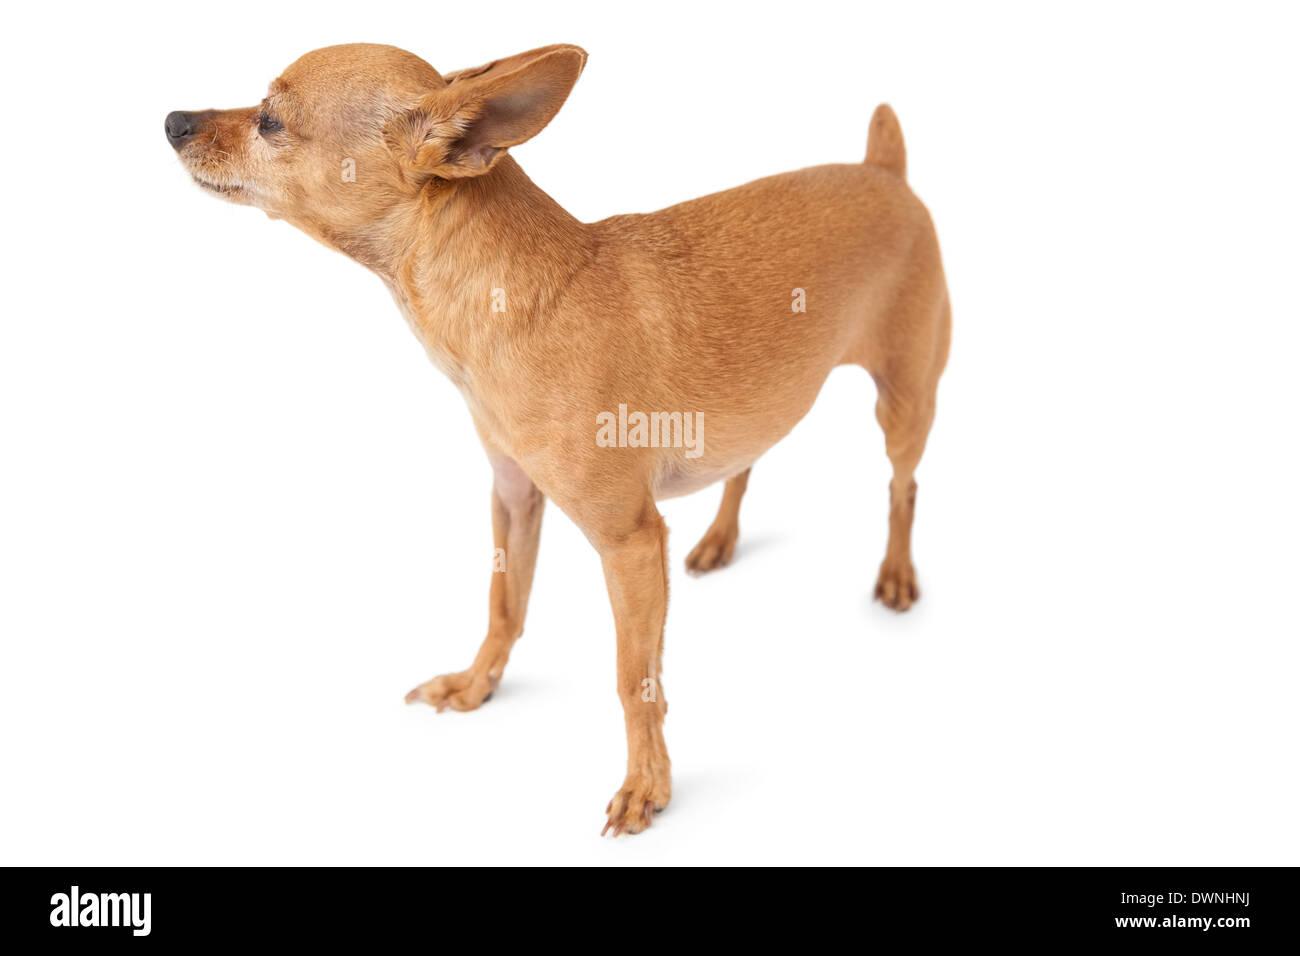 Full length of a pet dog - Stock Image